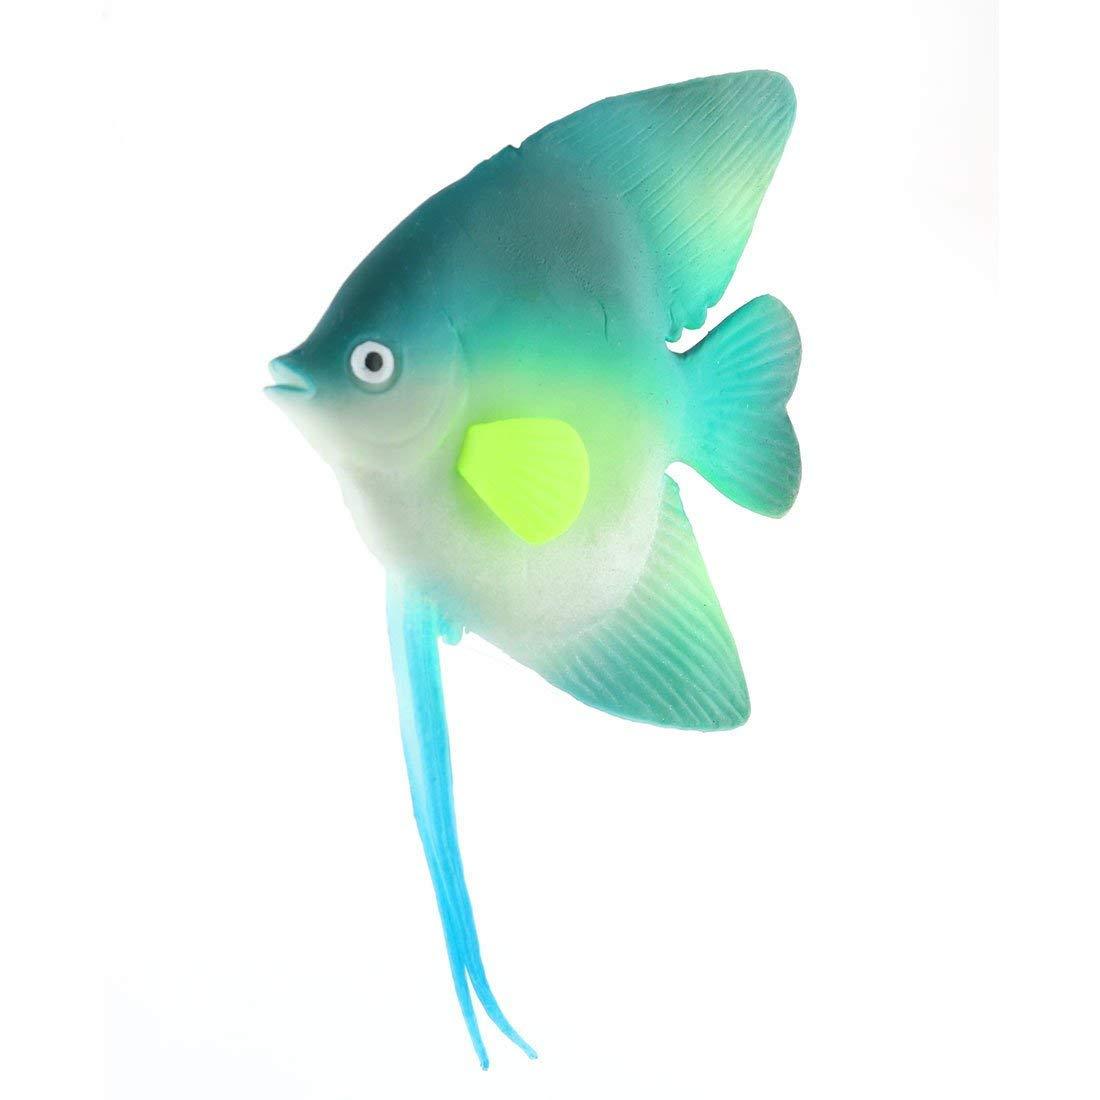 1Pc Silicone Artificial Floating Hippocampus Decor Multicolor for Fish Tank Aquarium